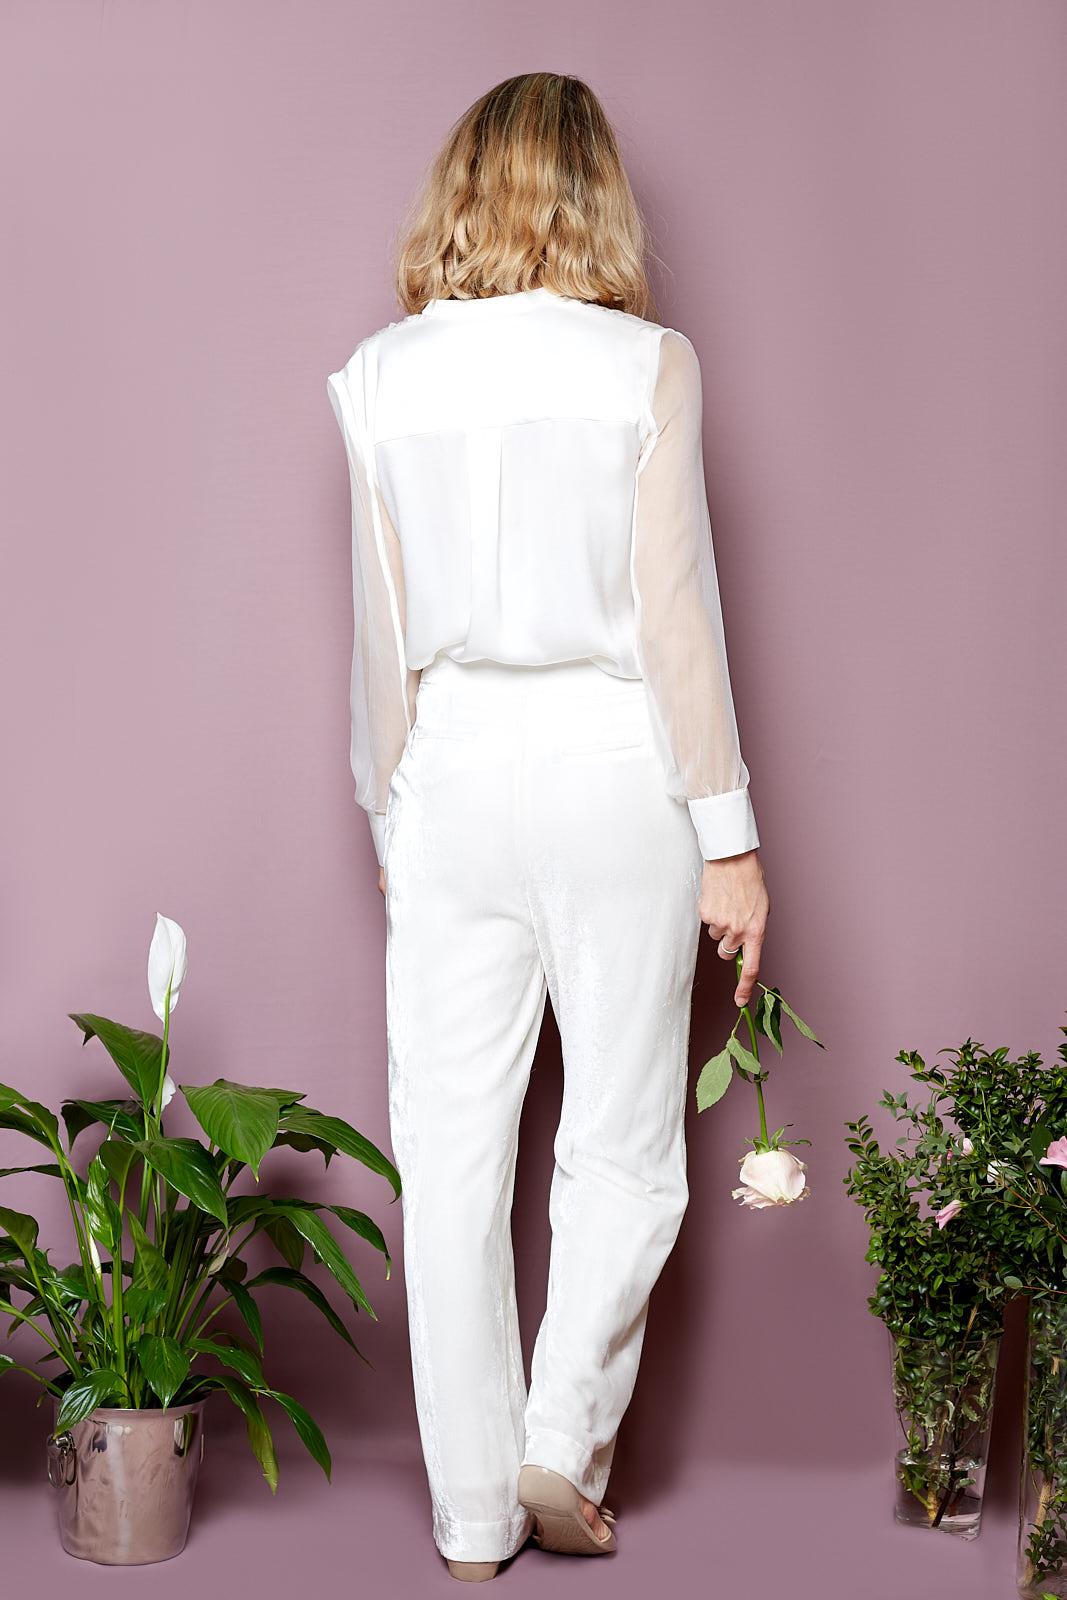 Silk Chemise & Wide Leg Velvet Trousers  Chemise in Sandwashed Silk Satin & Silk Gauze, Vintage Glass Buttons  Wide Leg Trousers in Silk Cotton Velvet, Lined in Sandwashed Silk Satin